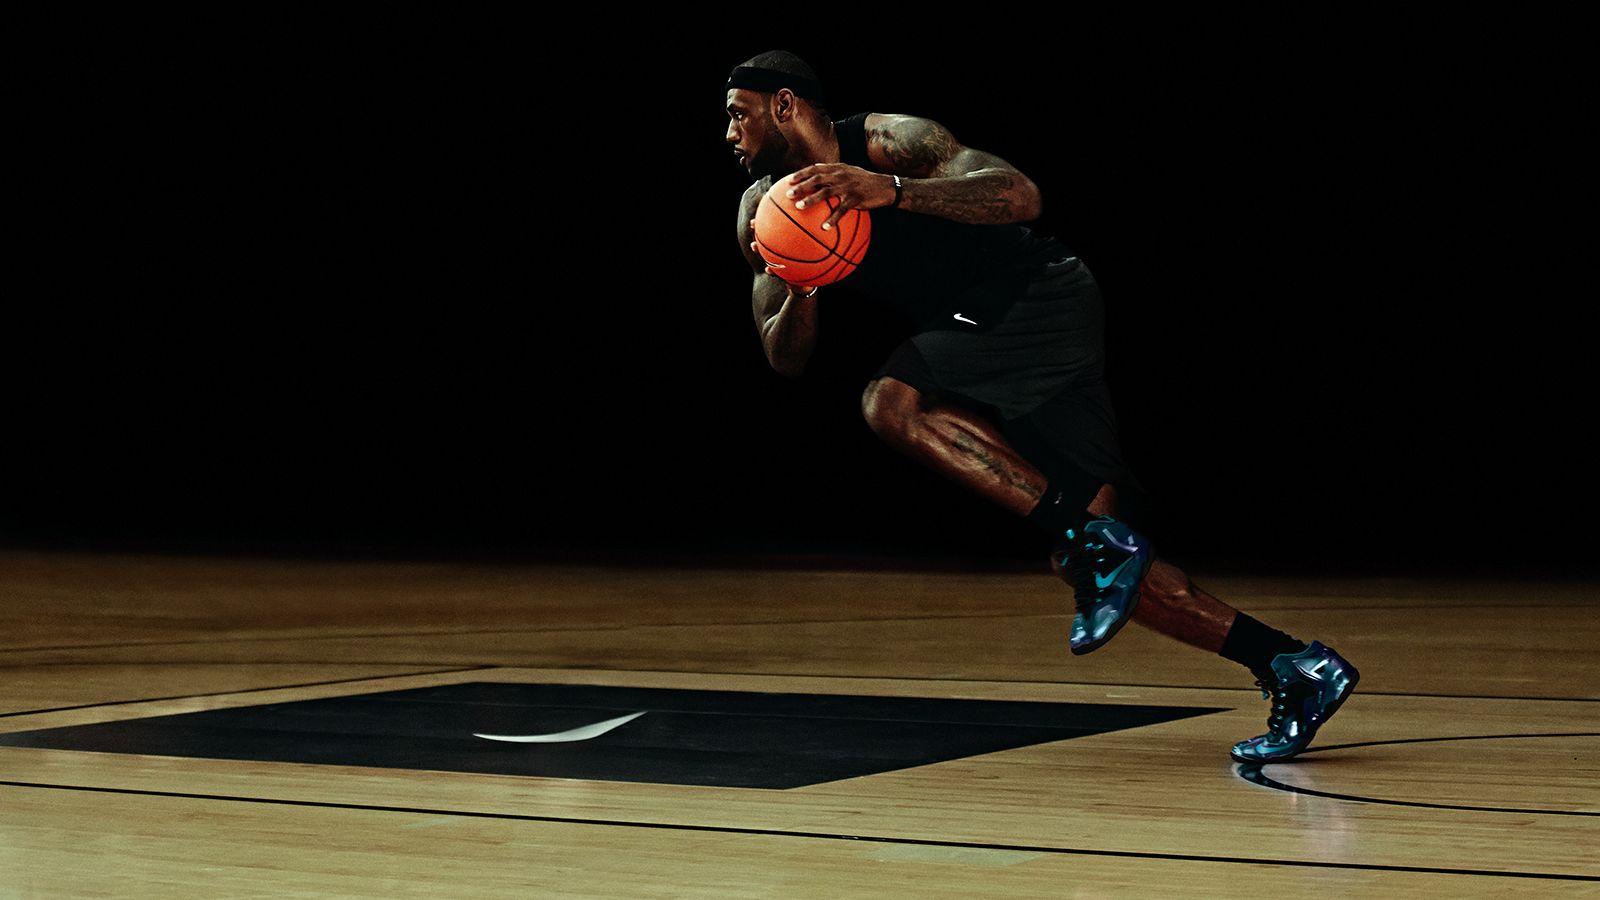 Basketball Nike Shoes Air Wallpaper Image 14277 Wallpaper 1600x900